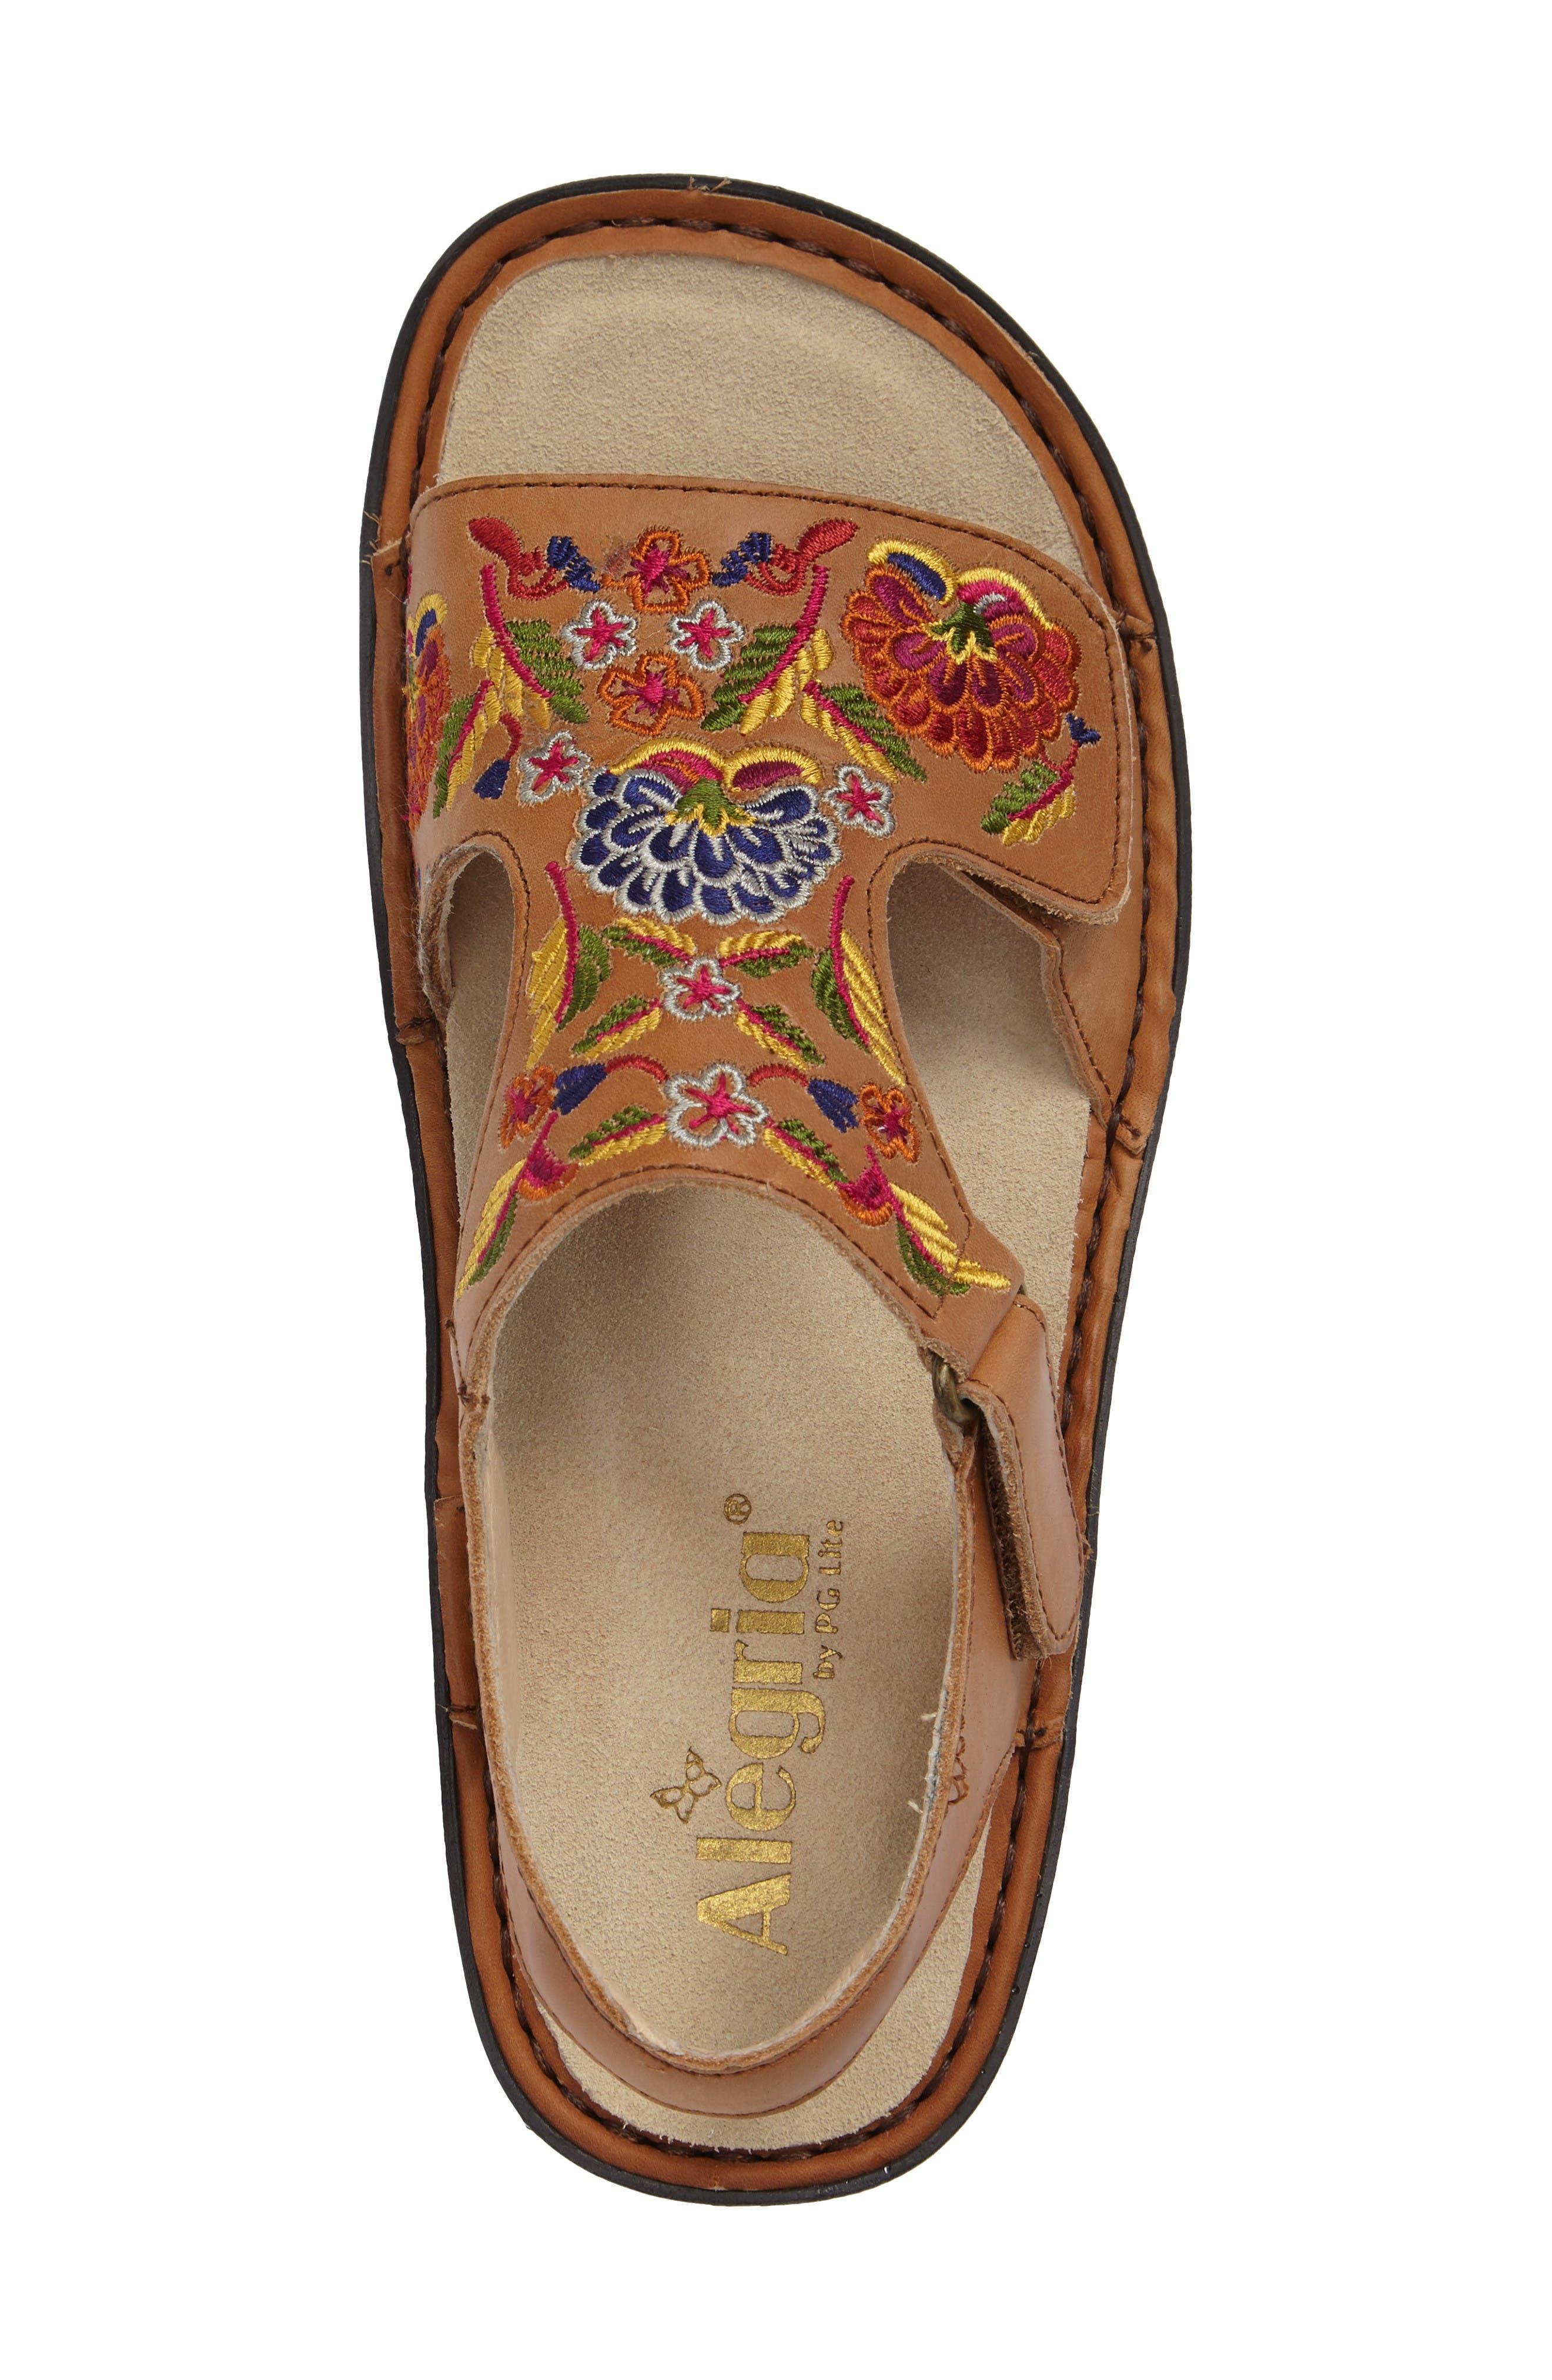 Viki Embroidered Sandal,                             Alternate thumbnail 3, color,                             Cognac Pins/ Needles Leather